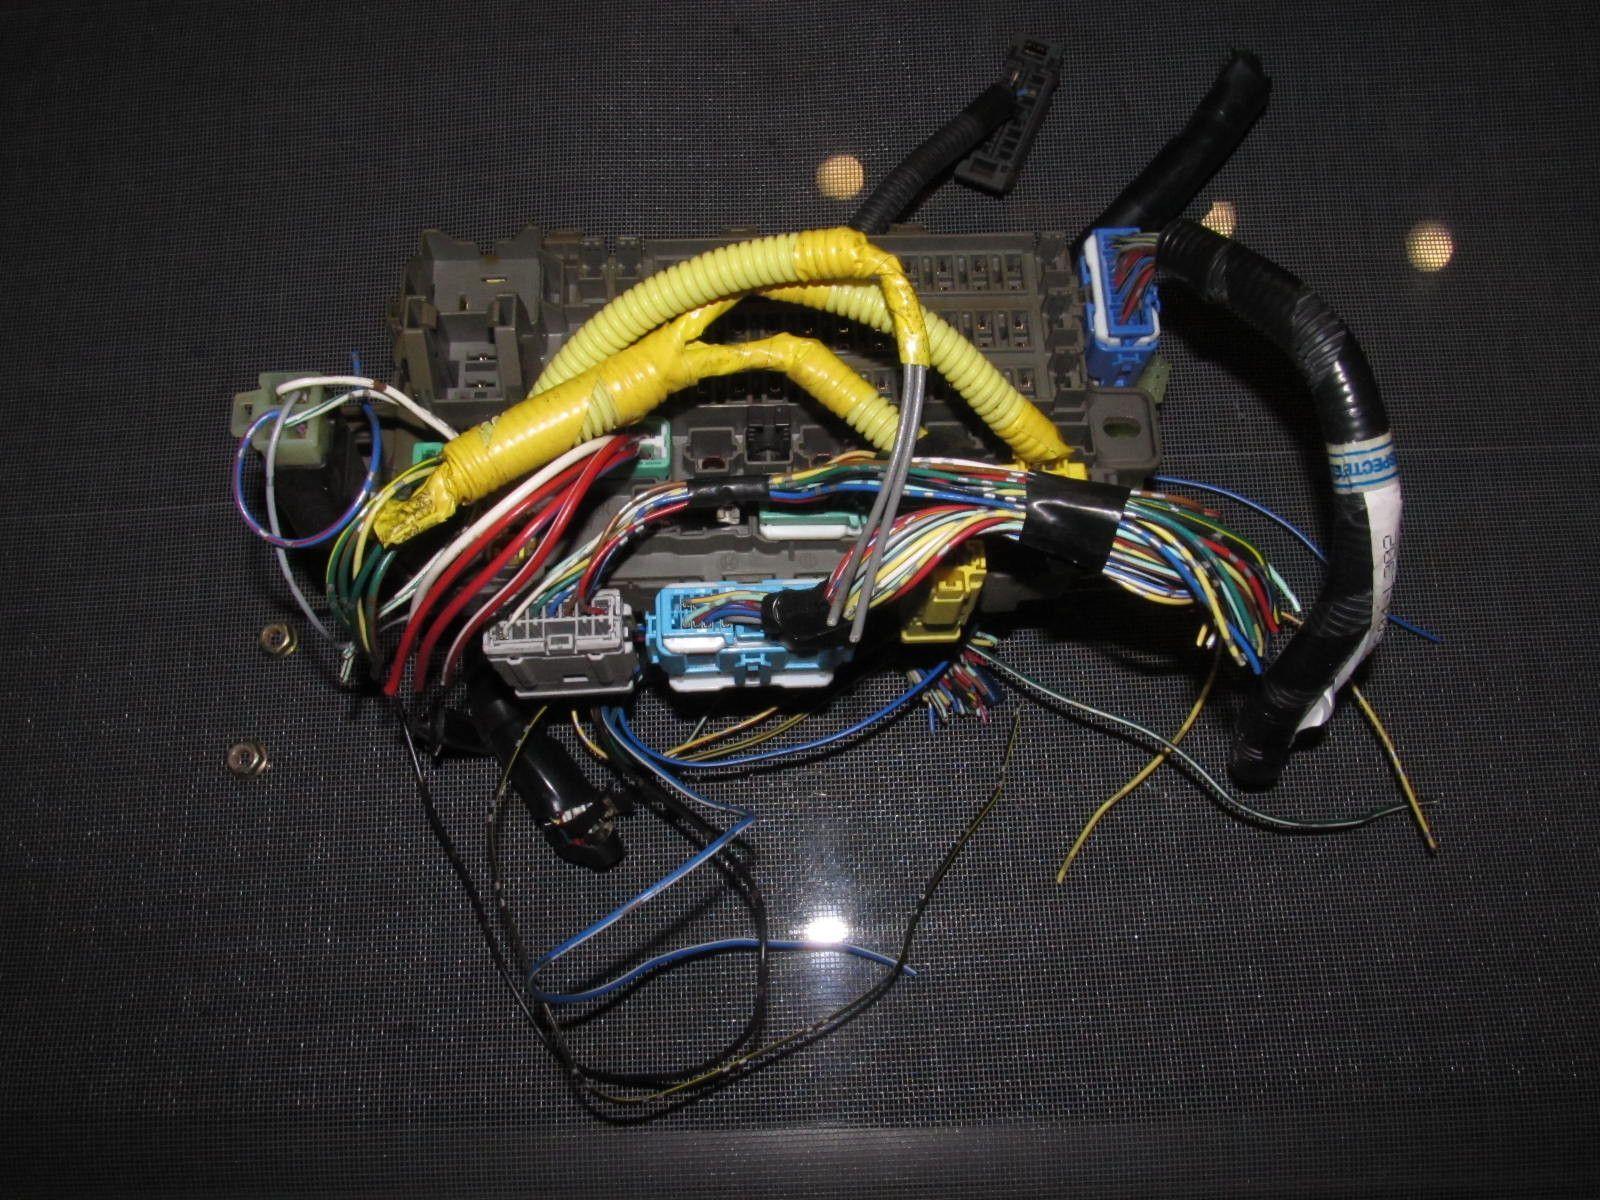 96-00 Honda Civic OEM Interior Fuse Box | Autopartone.com ... on